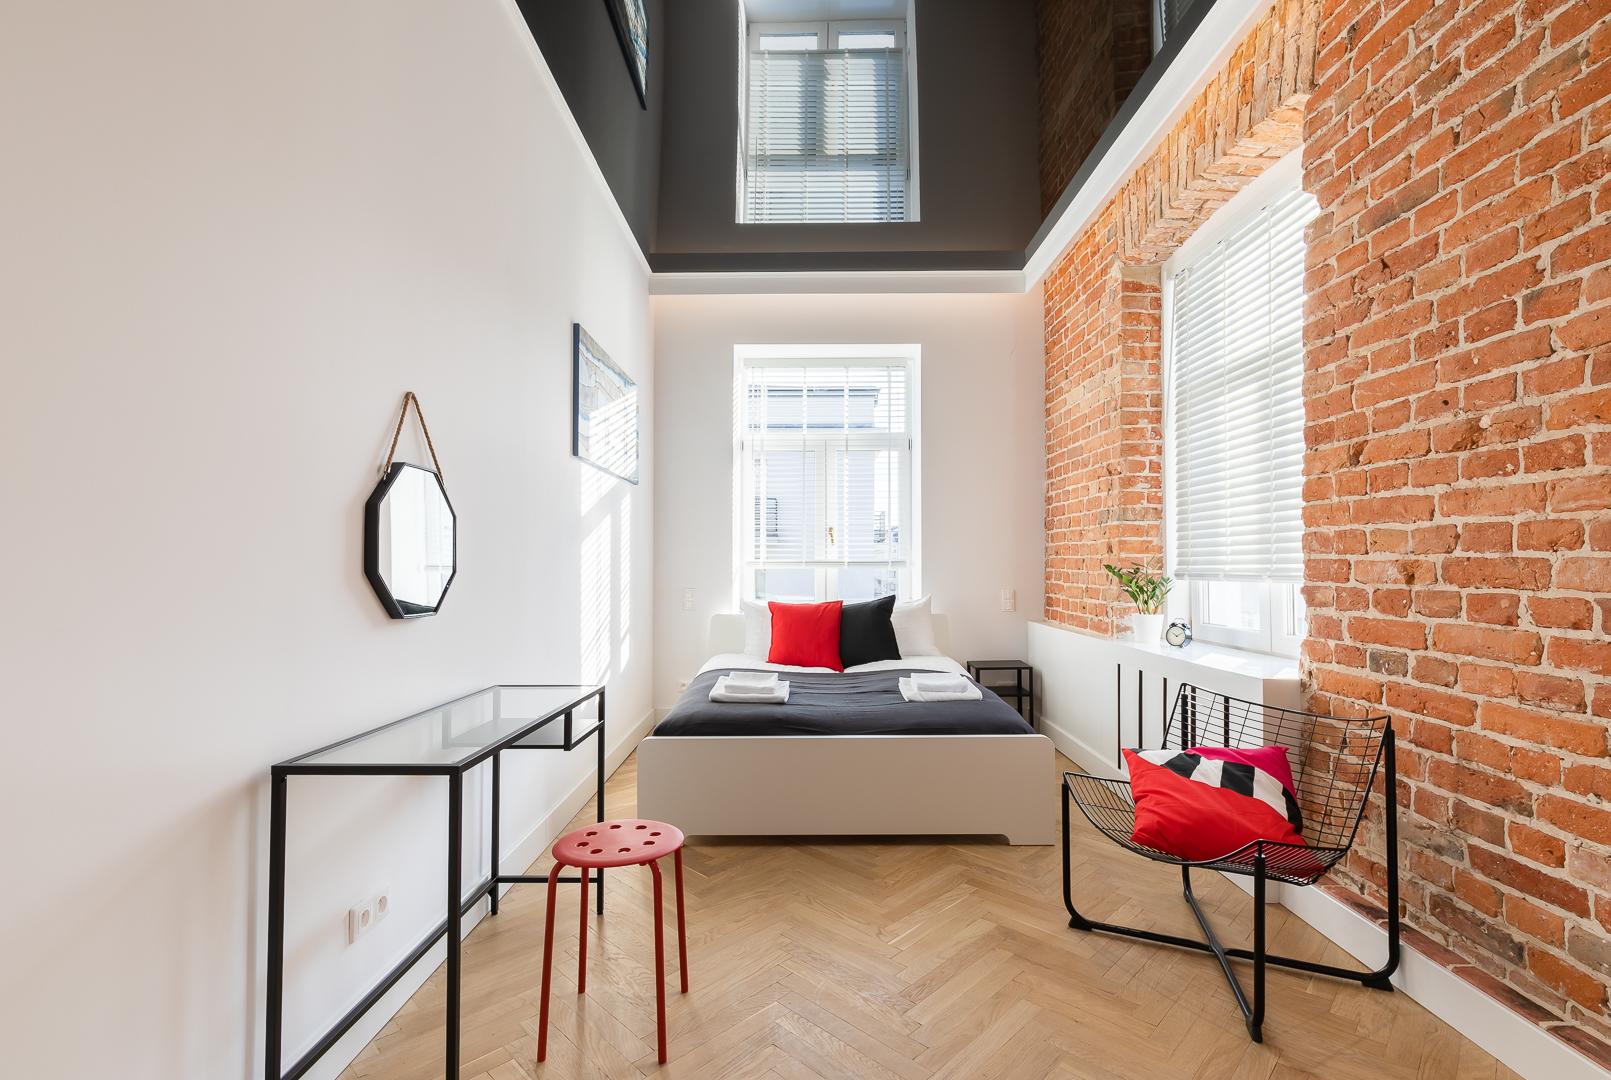 Bedroom at Wspolna Apartments